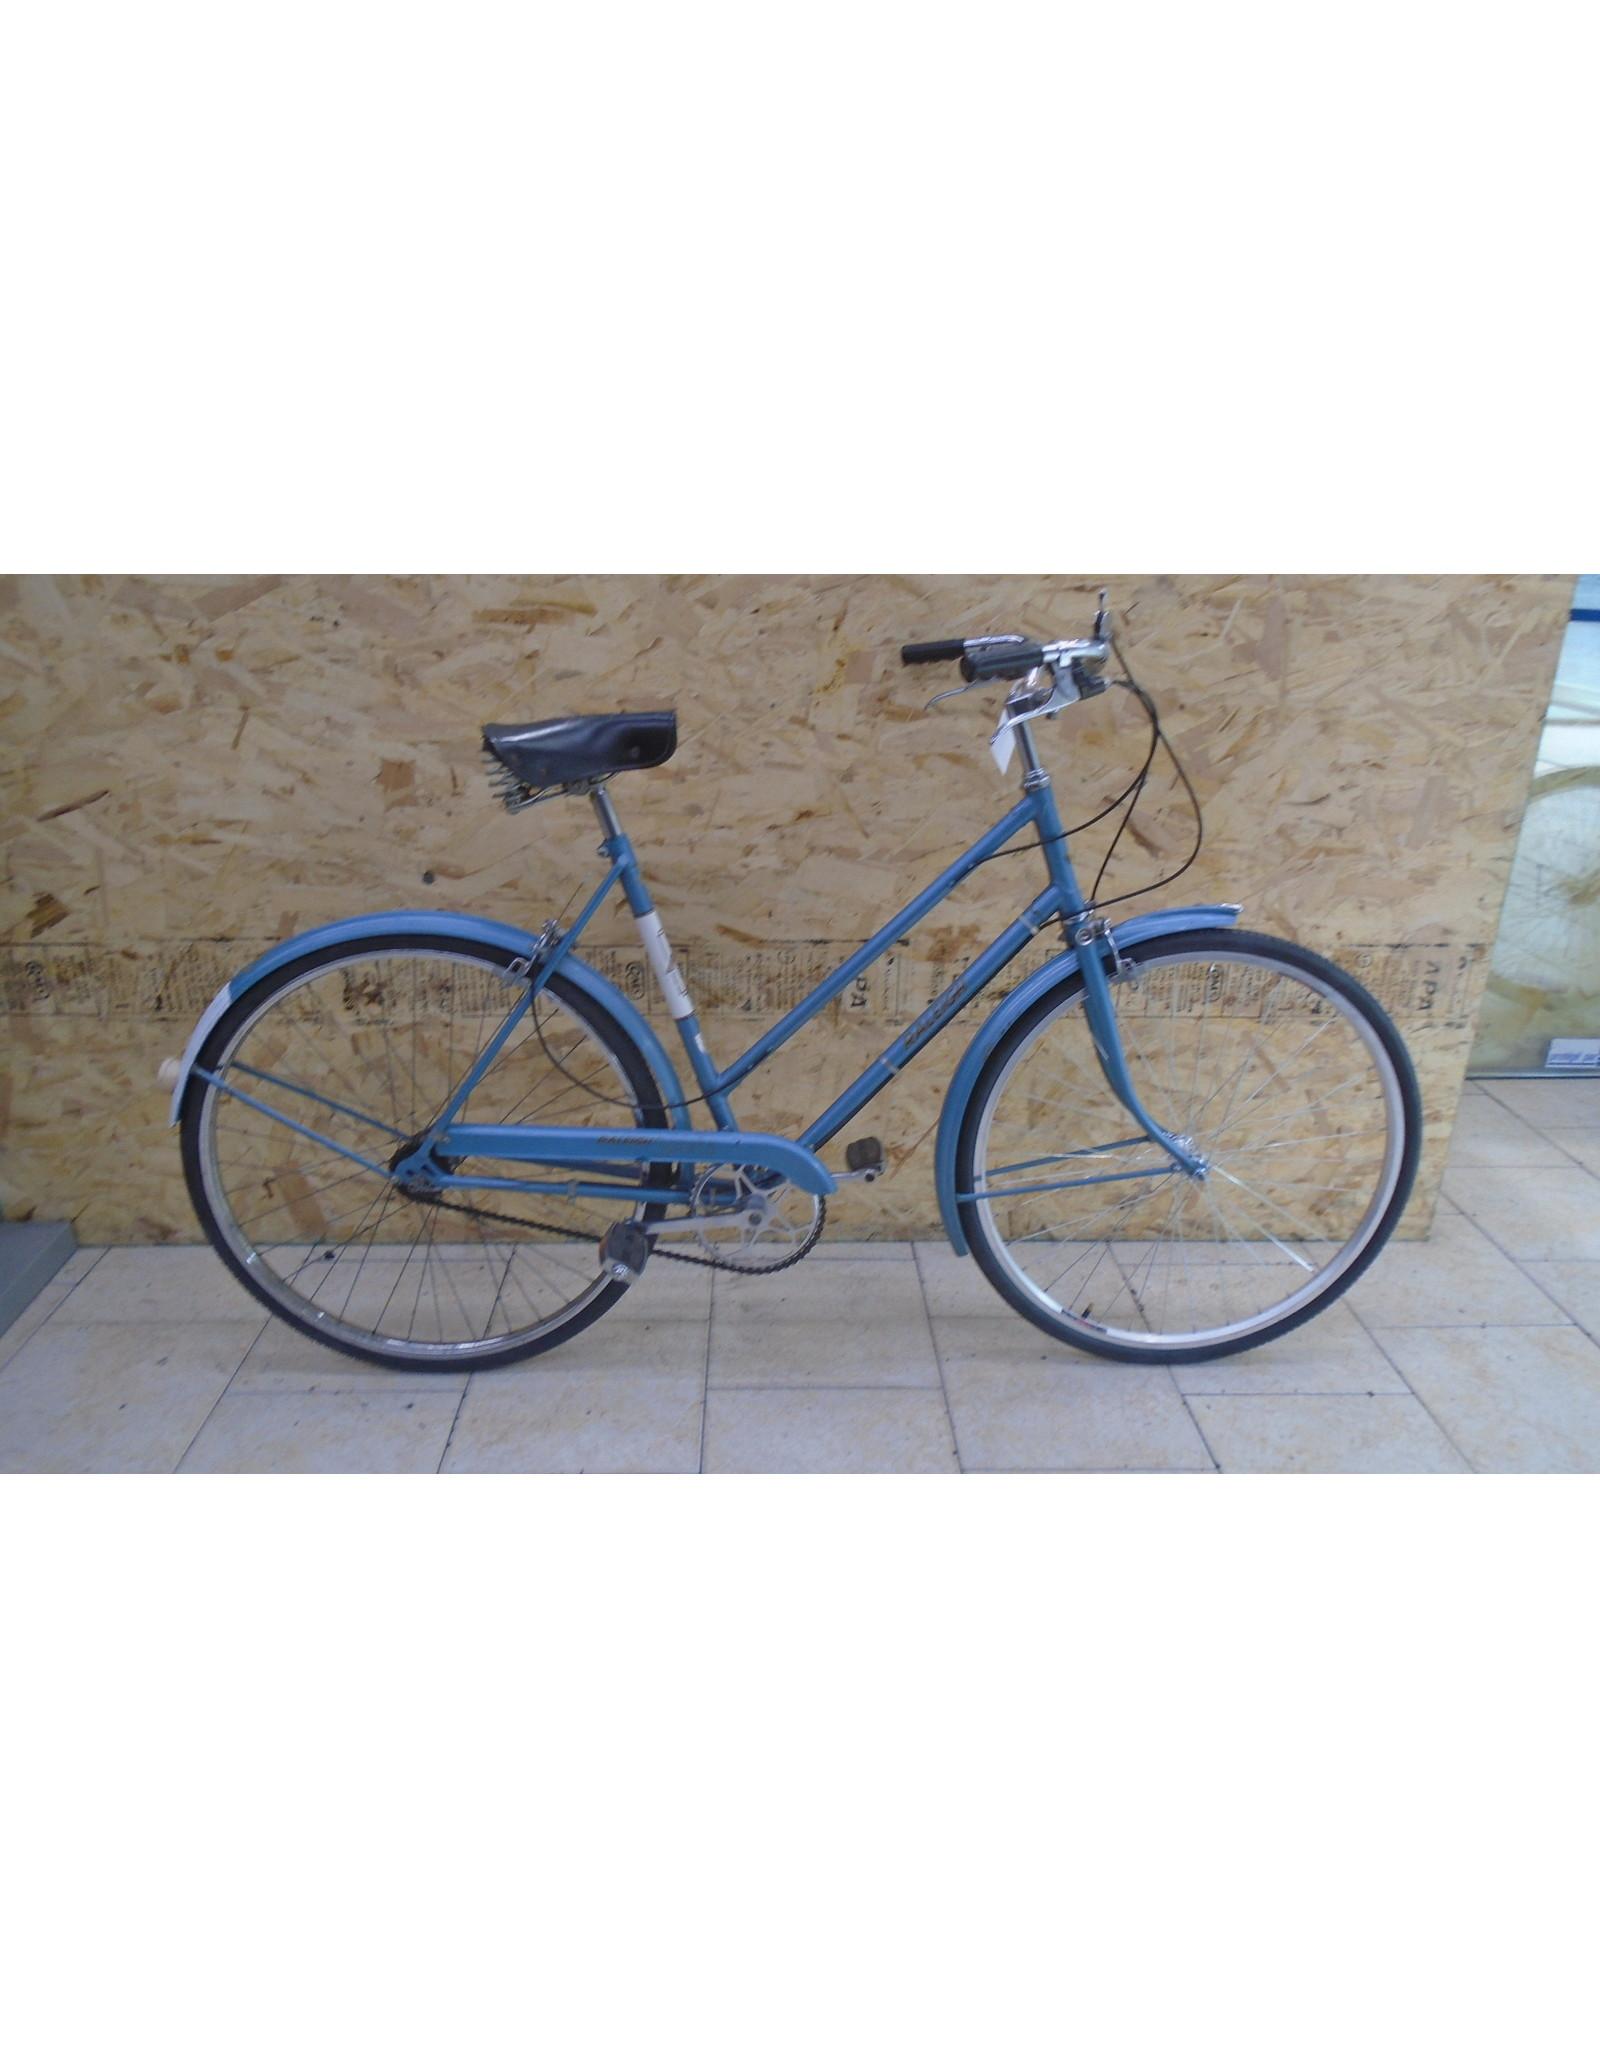 Used Raleigh City Bike 21 '' - 10131